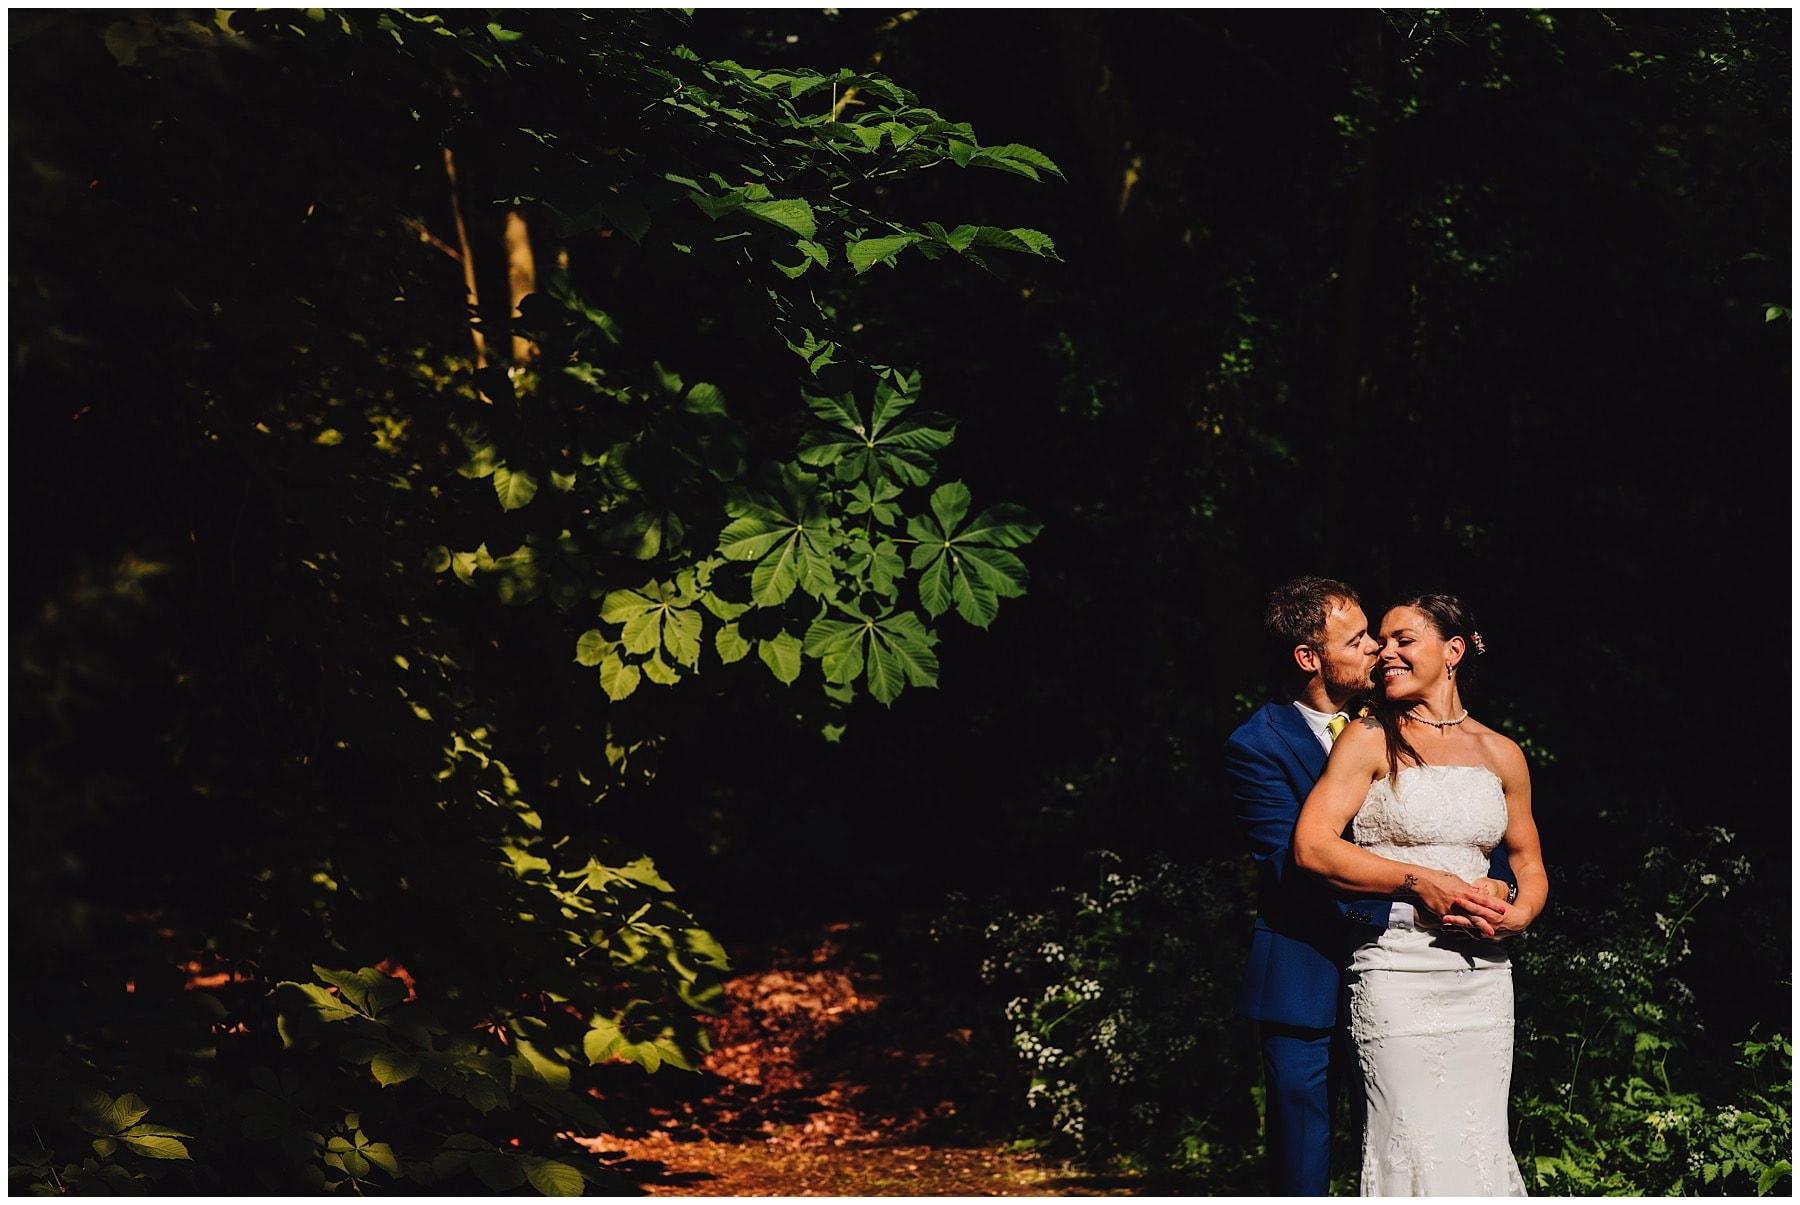 Hothorp Hall Woodlands Wedding Photographer 34